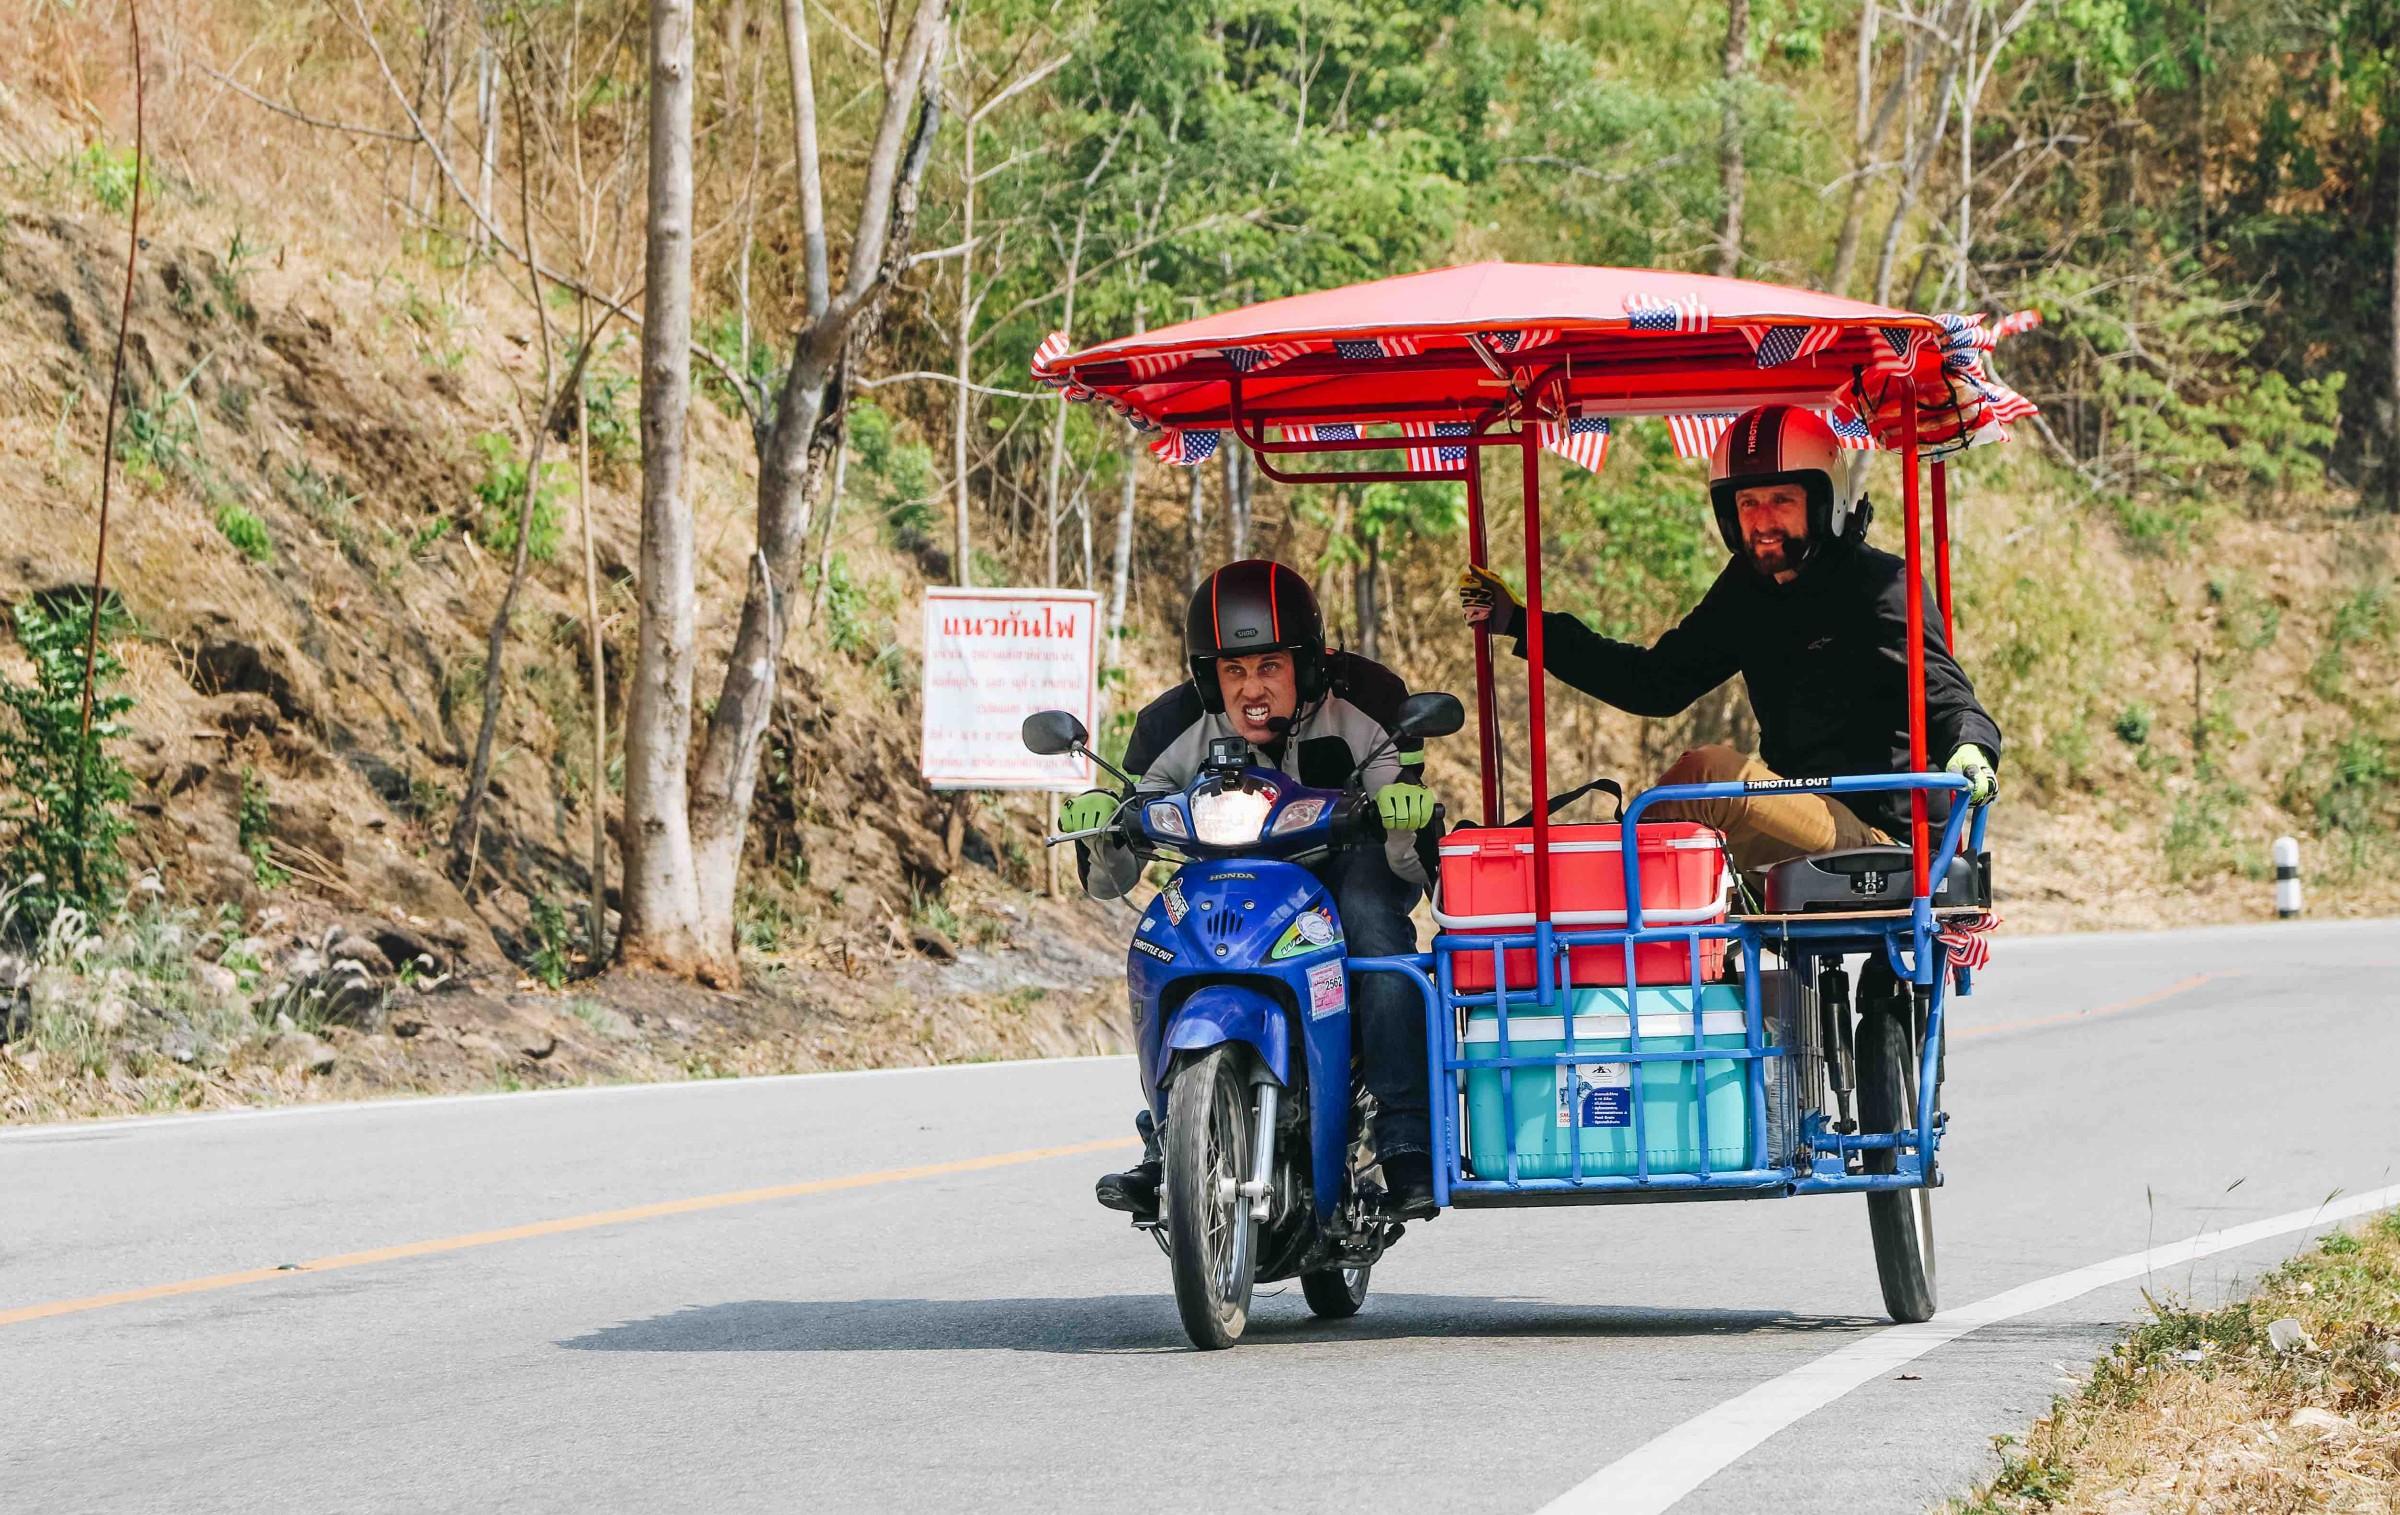 Seeing Thailand on a seven-horsepower sidecar hamburger